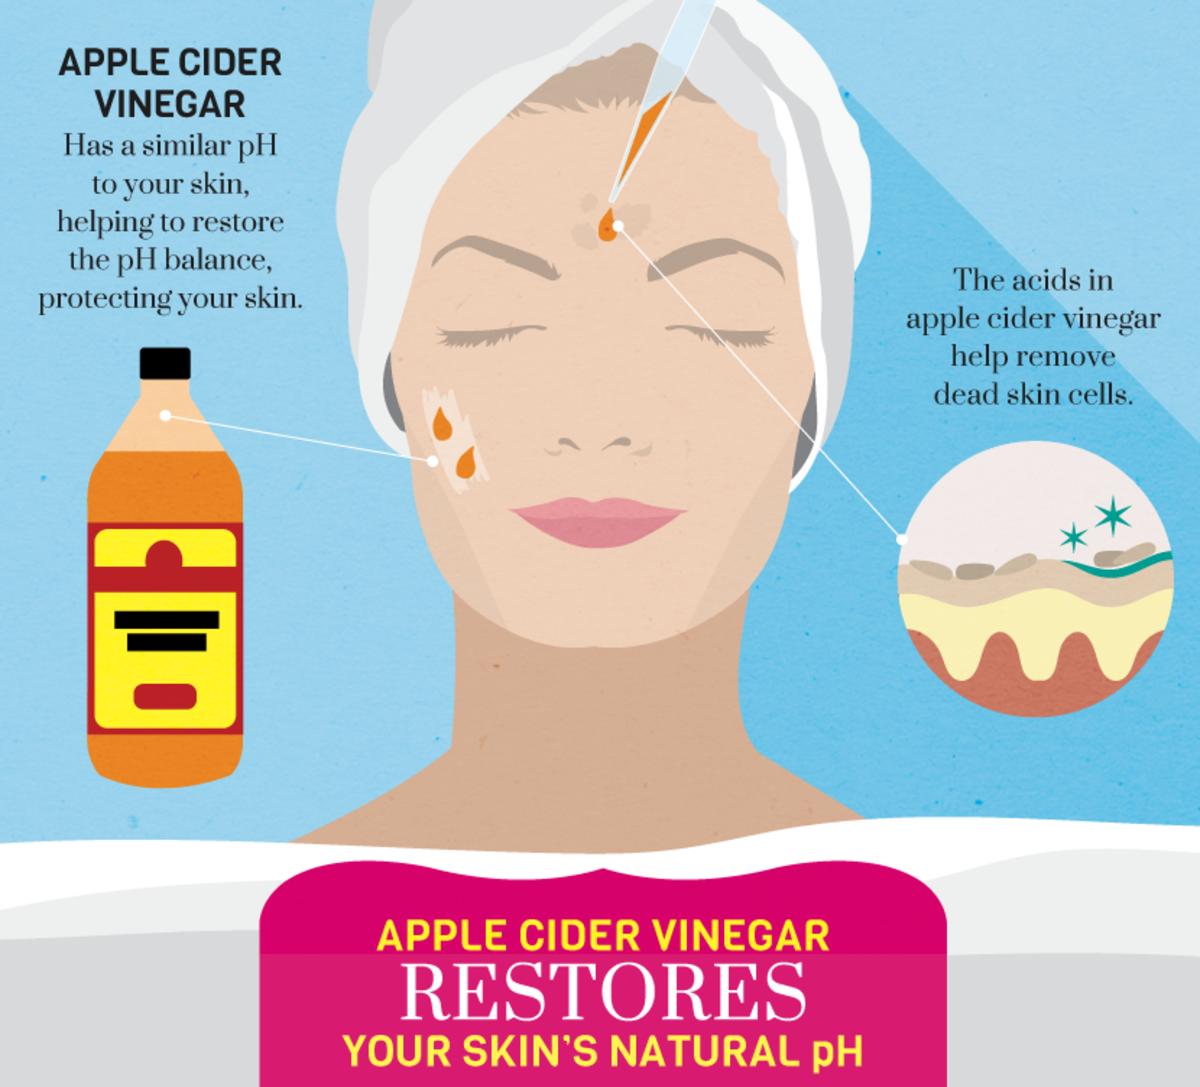 Apple cider vinegar has many benefits for the skin.